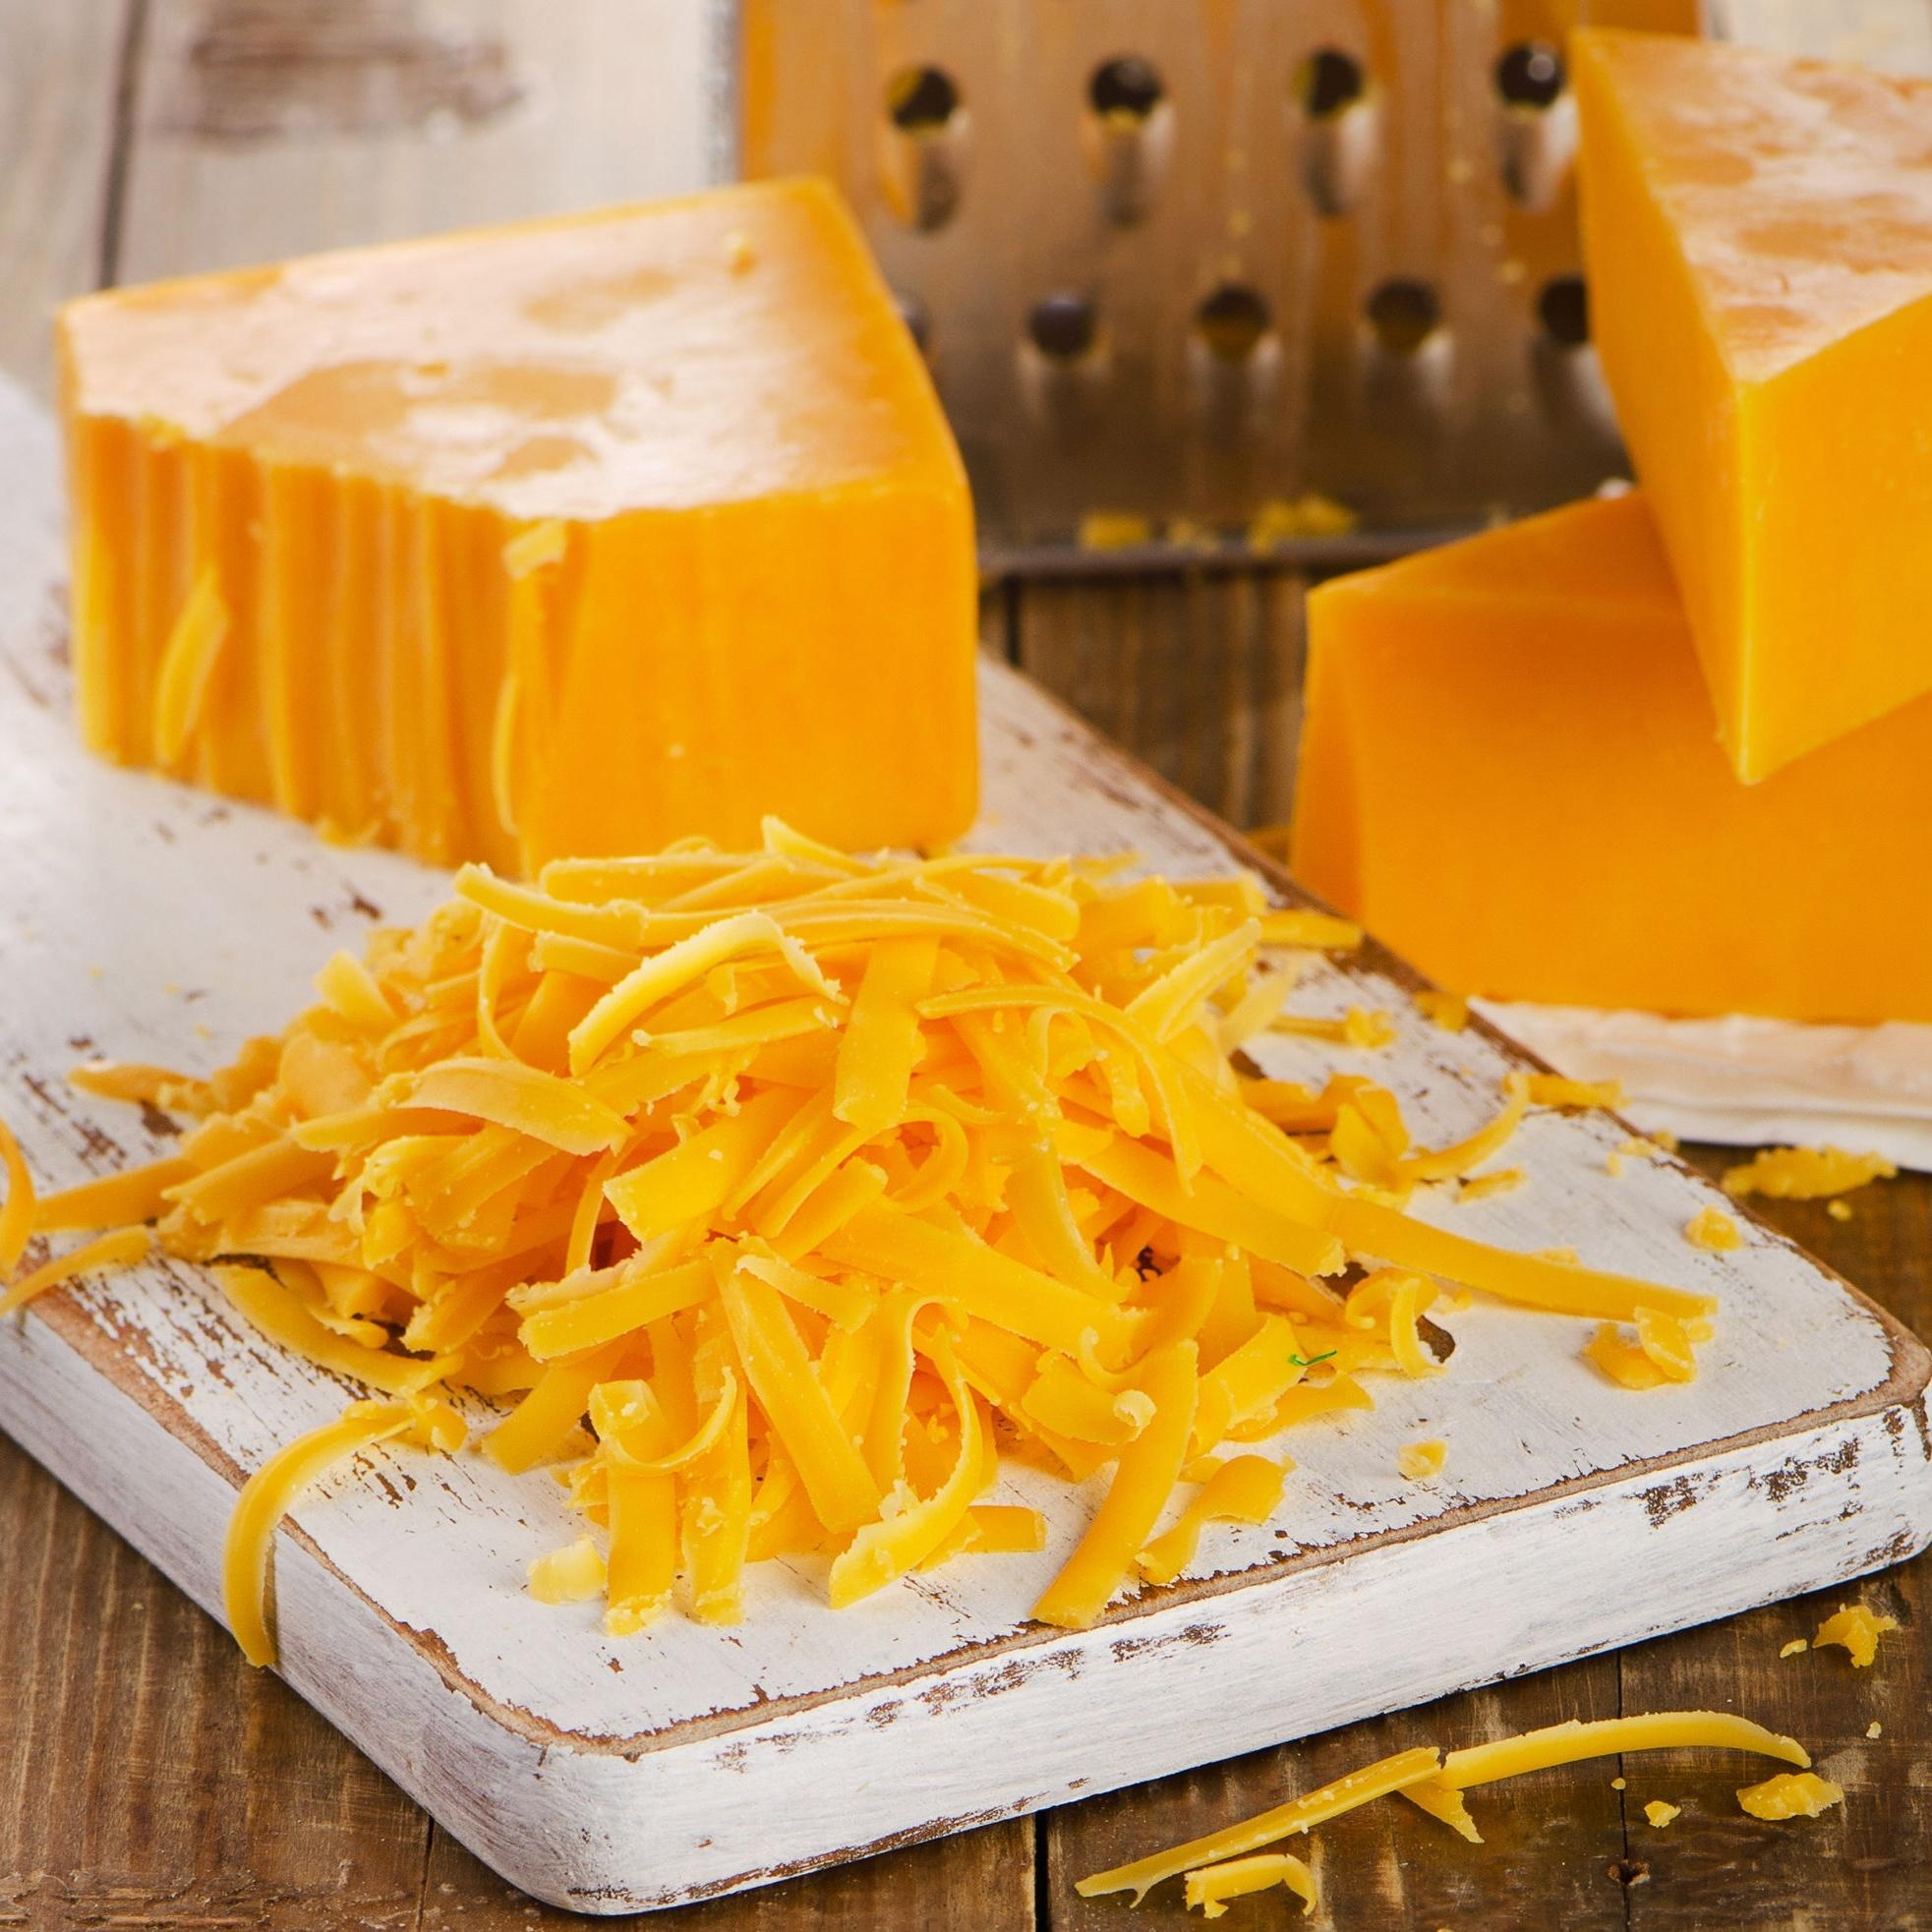 cheese2-650805-edited.jpg